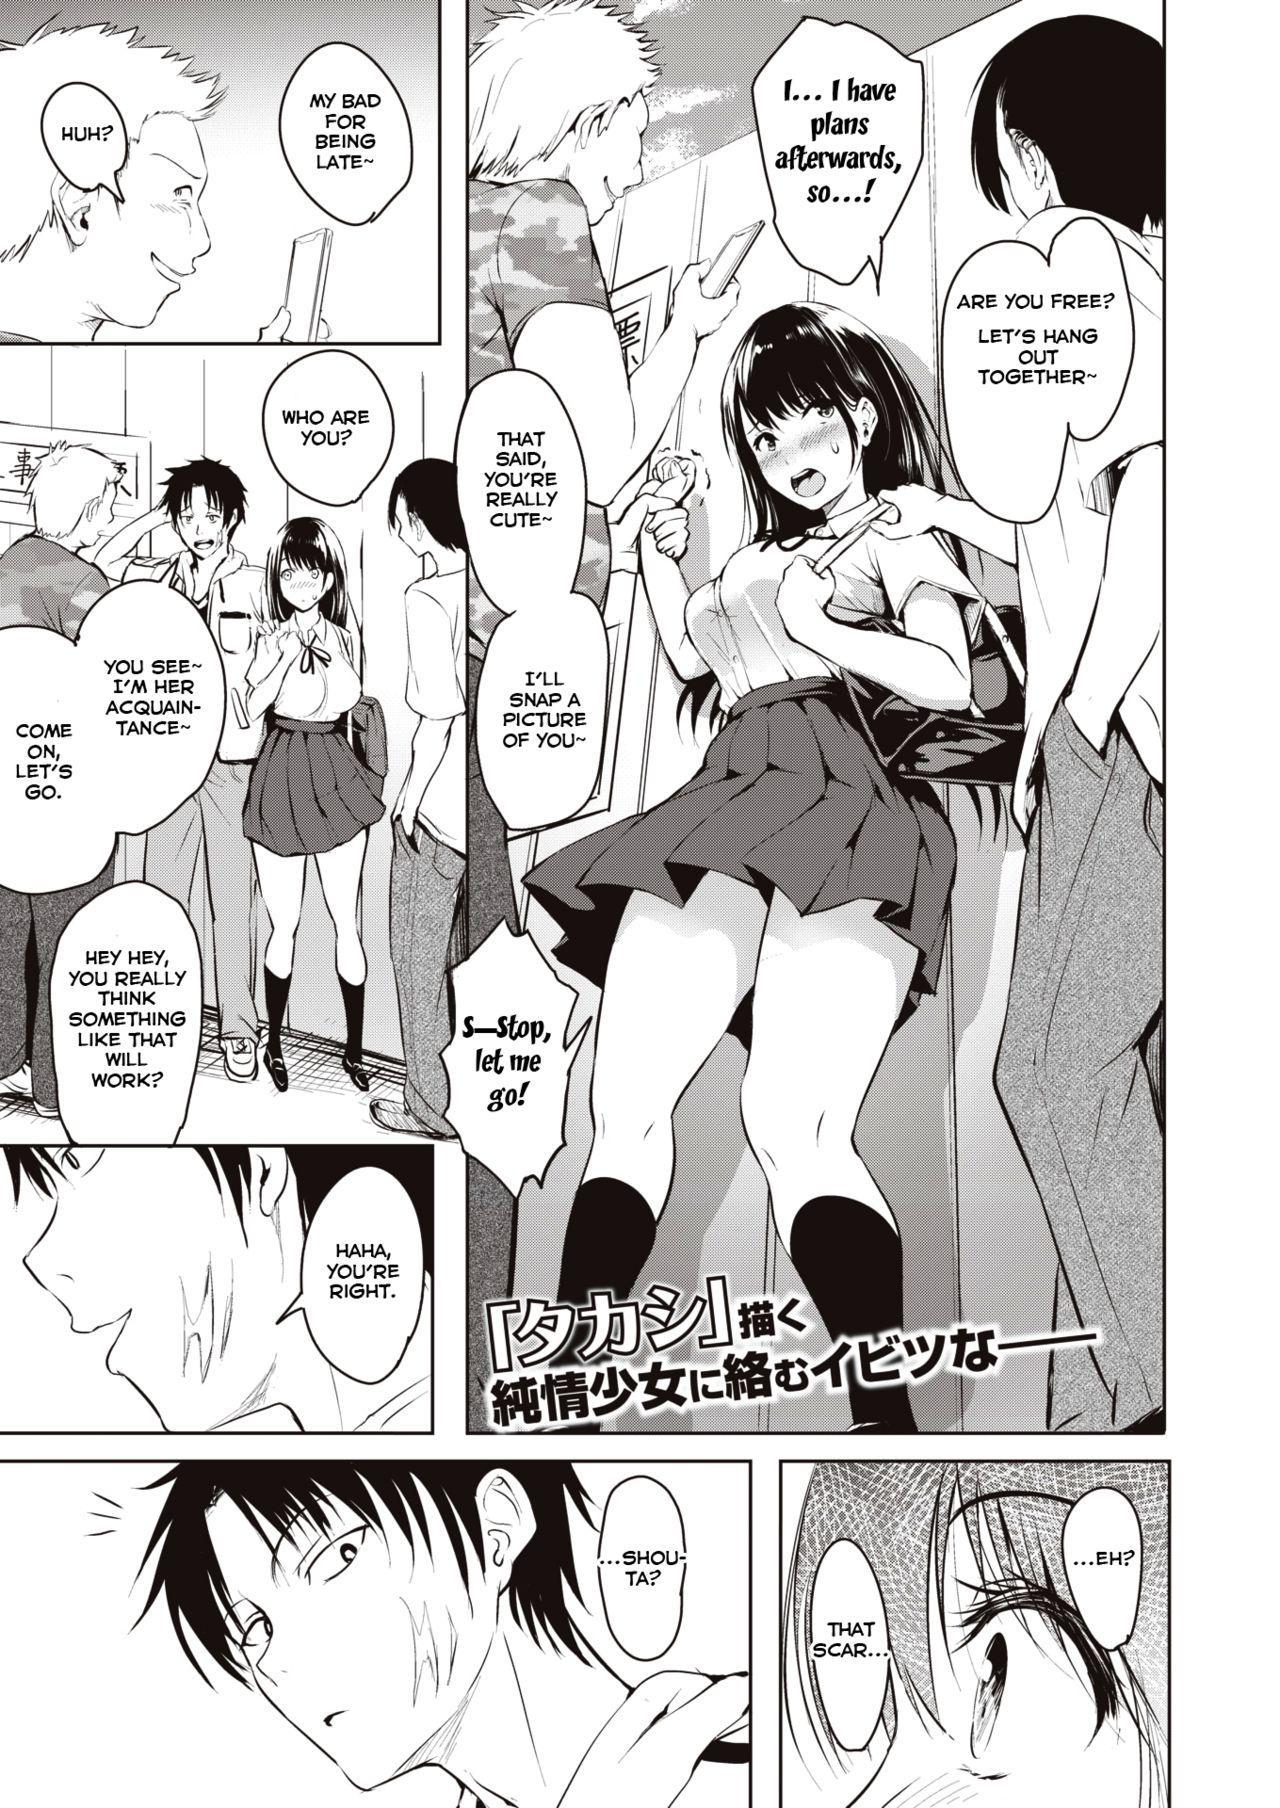 Hakuba no Ouji-sama | Prince Charming 0